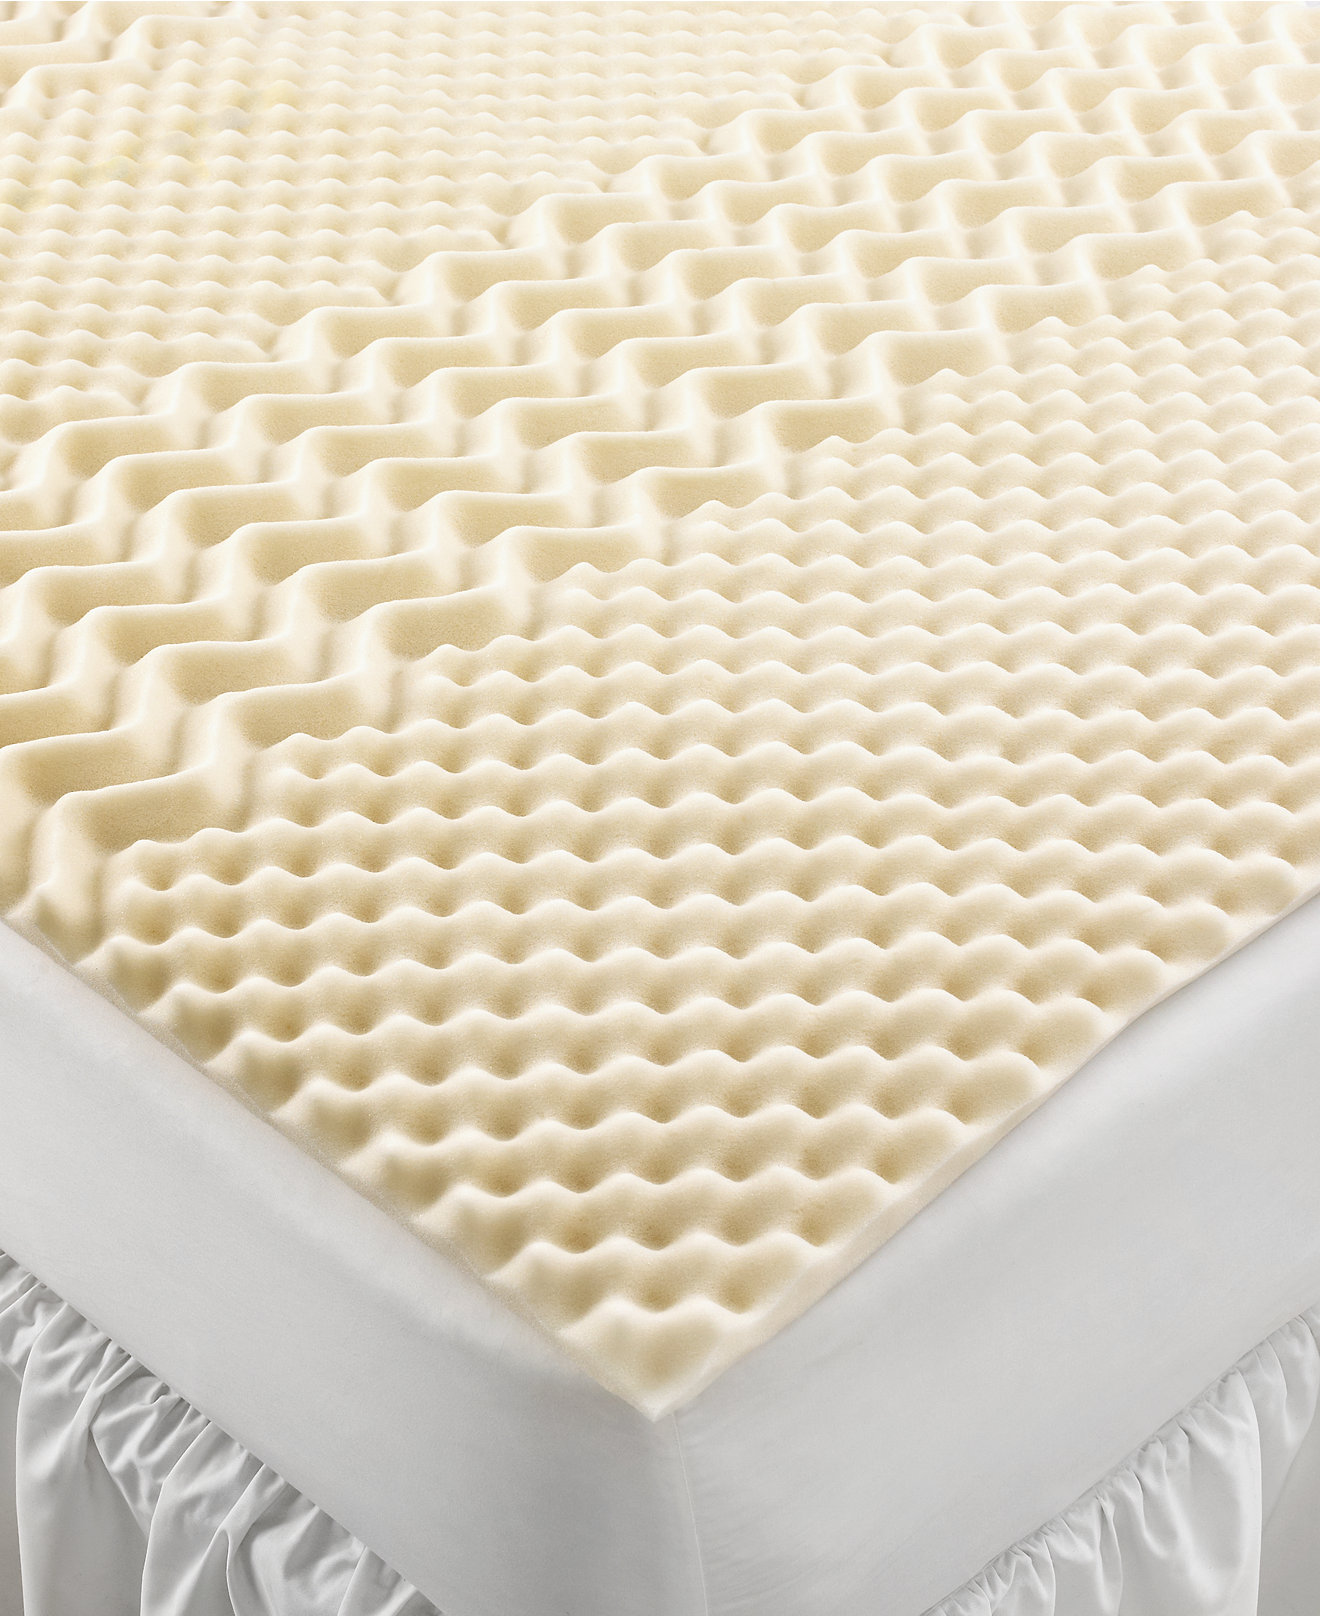 Home Design 5 Zone Memory Foam Mattress Toppers